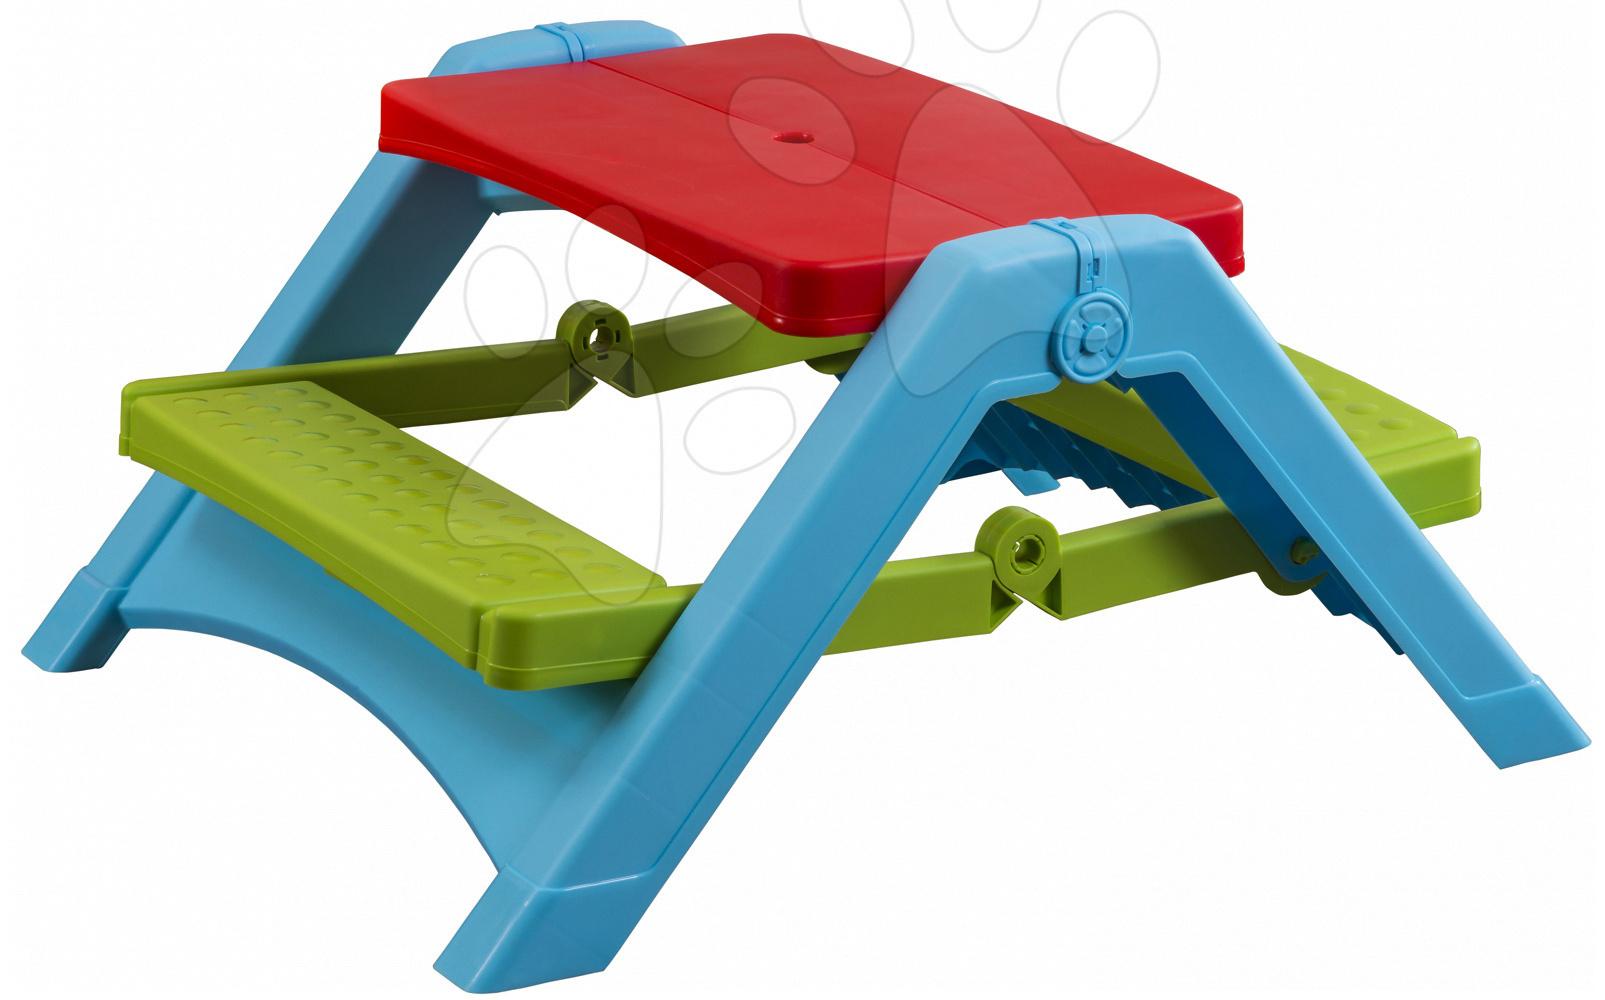 Stůl PalPlay s lavičkami skládací